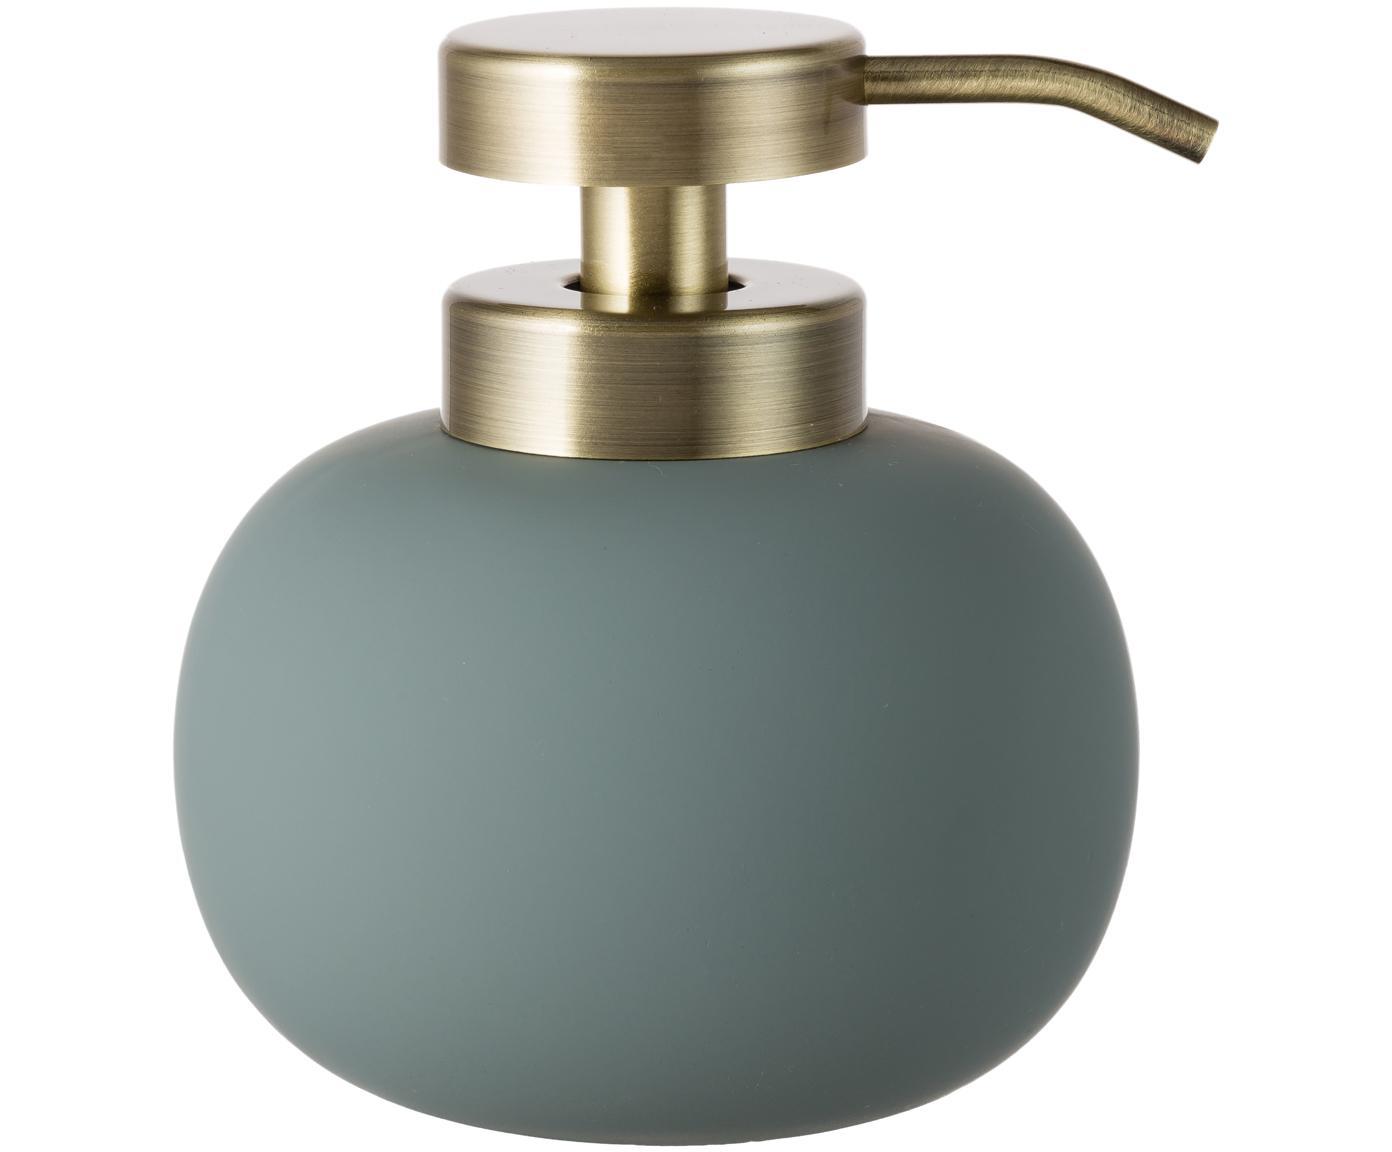 Keramik-Seifenspender Lotus, Behälter: Keramik, Pumpkopf: Metall, Grün, Messingfarben, Ø 11 x H 13 cm